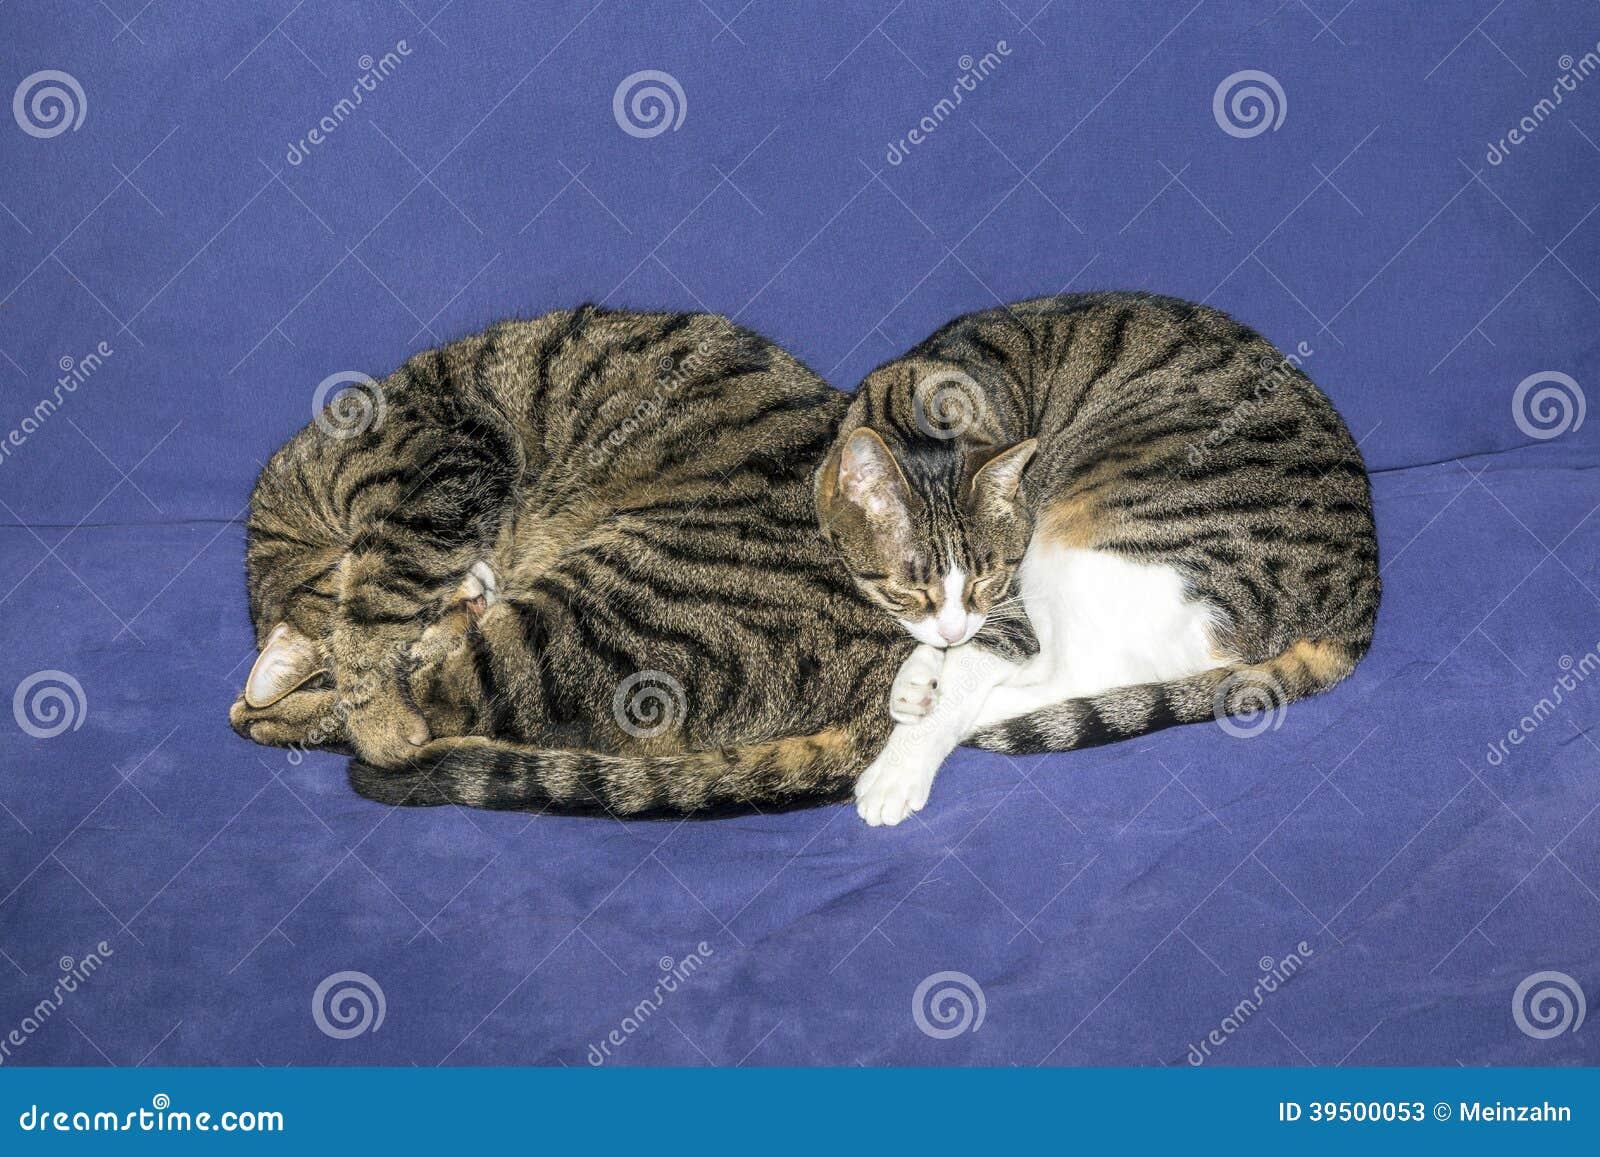 Two sleeping tabby cats